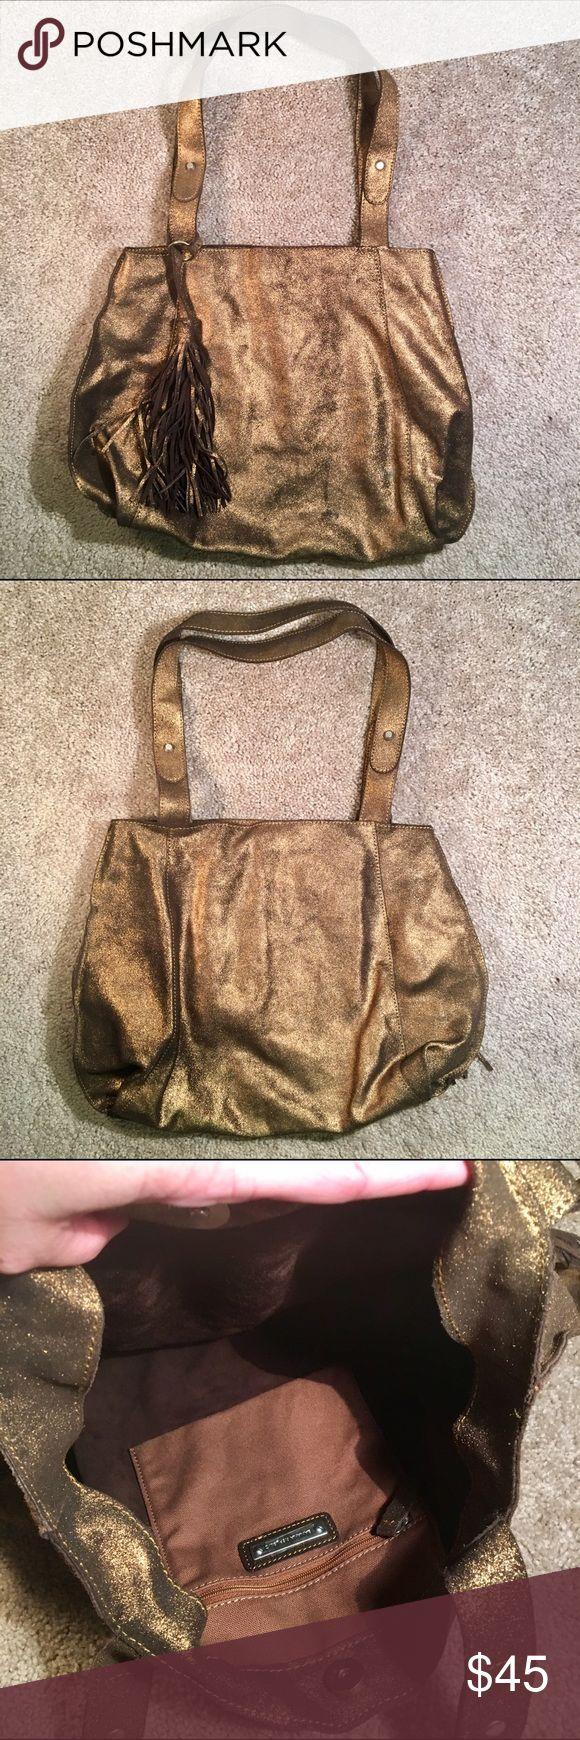 Banana Republic Metallic Bronze Leather Bag Tote Excellent condition. Banana Republic Bags Shoulder Bags